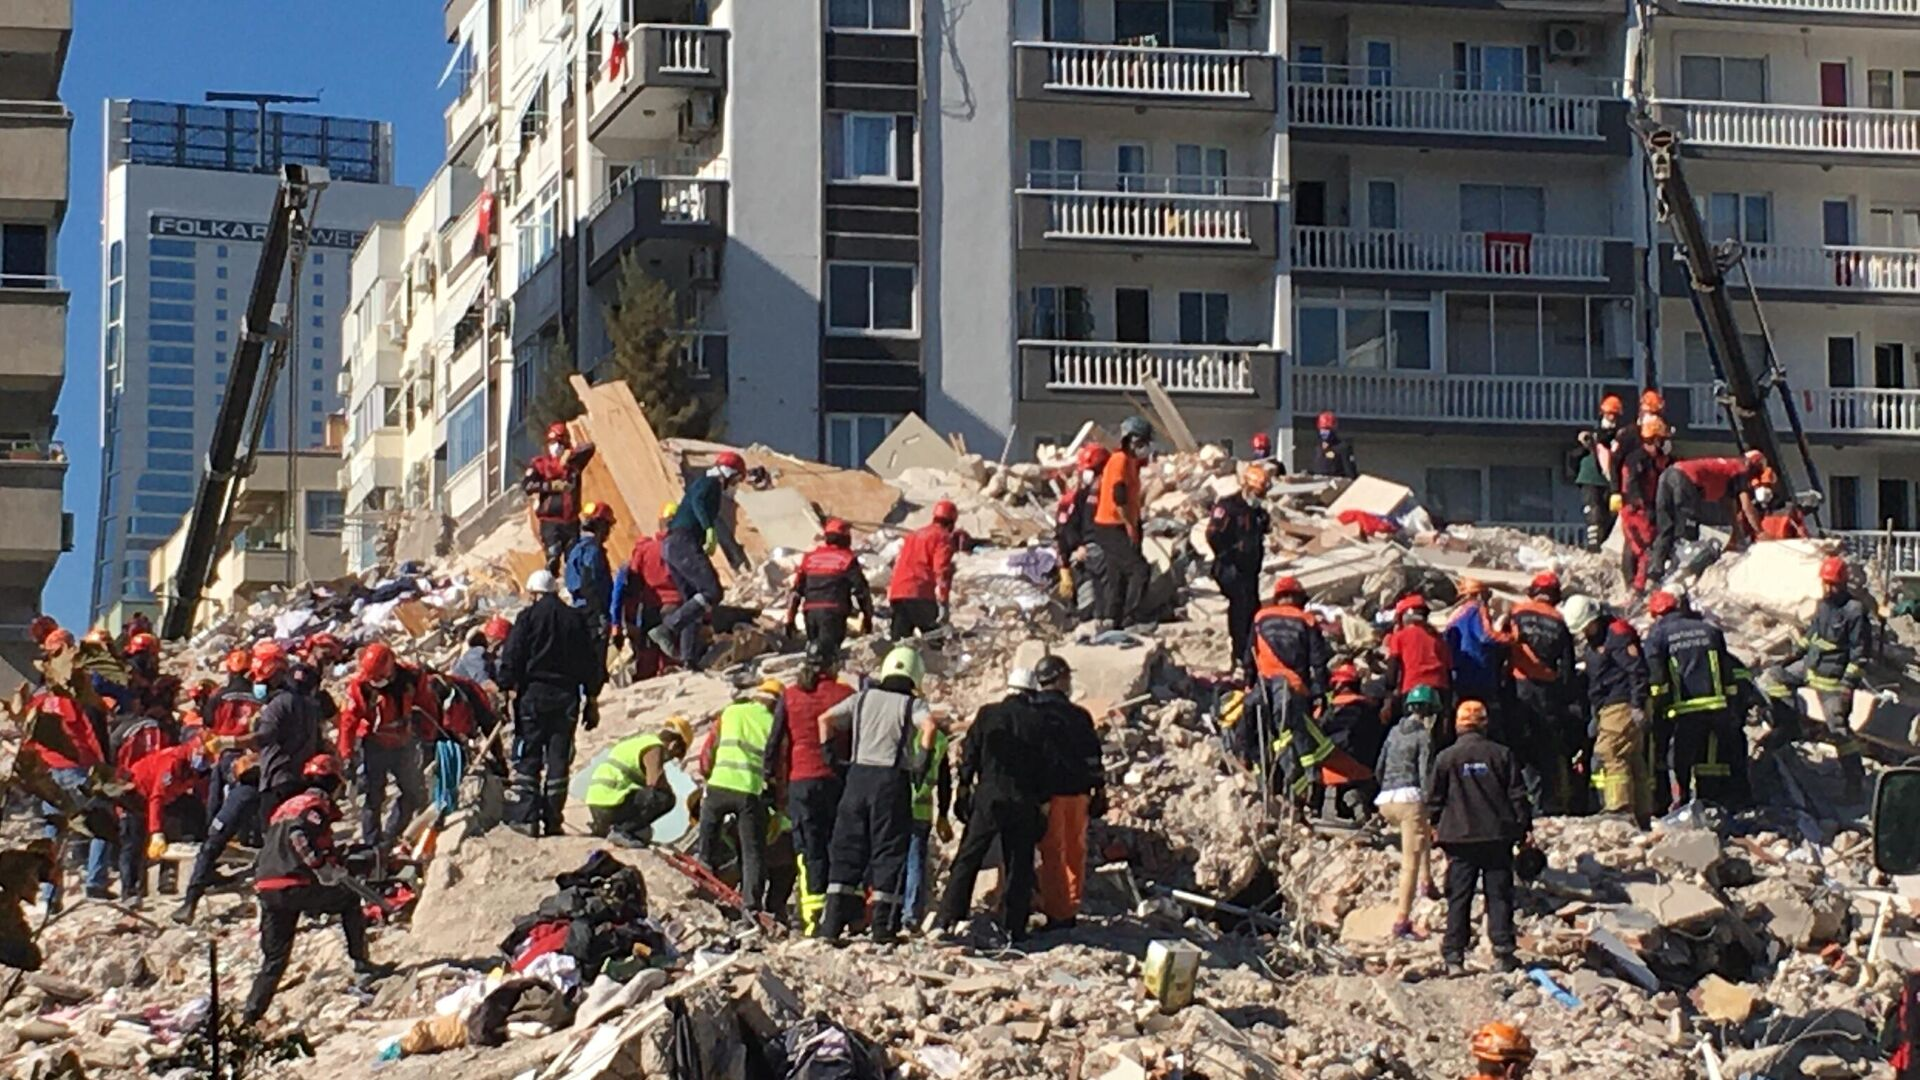 Ликвидация последствий землетрясения в Измире, Турция - РИА Новости, 1920, 05.11.2020